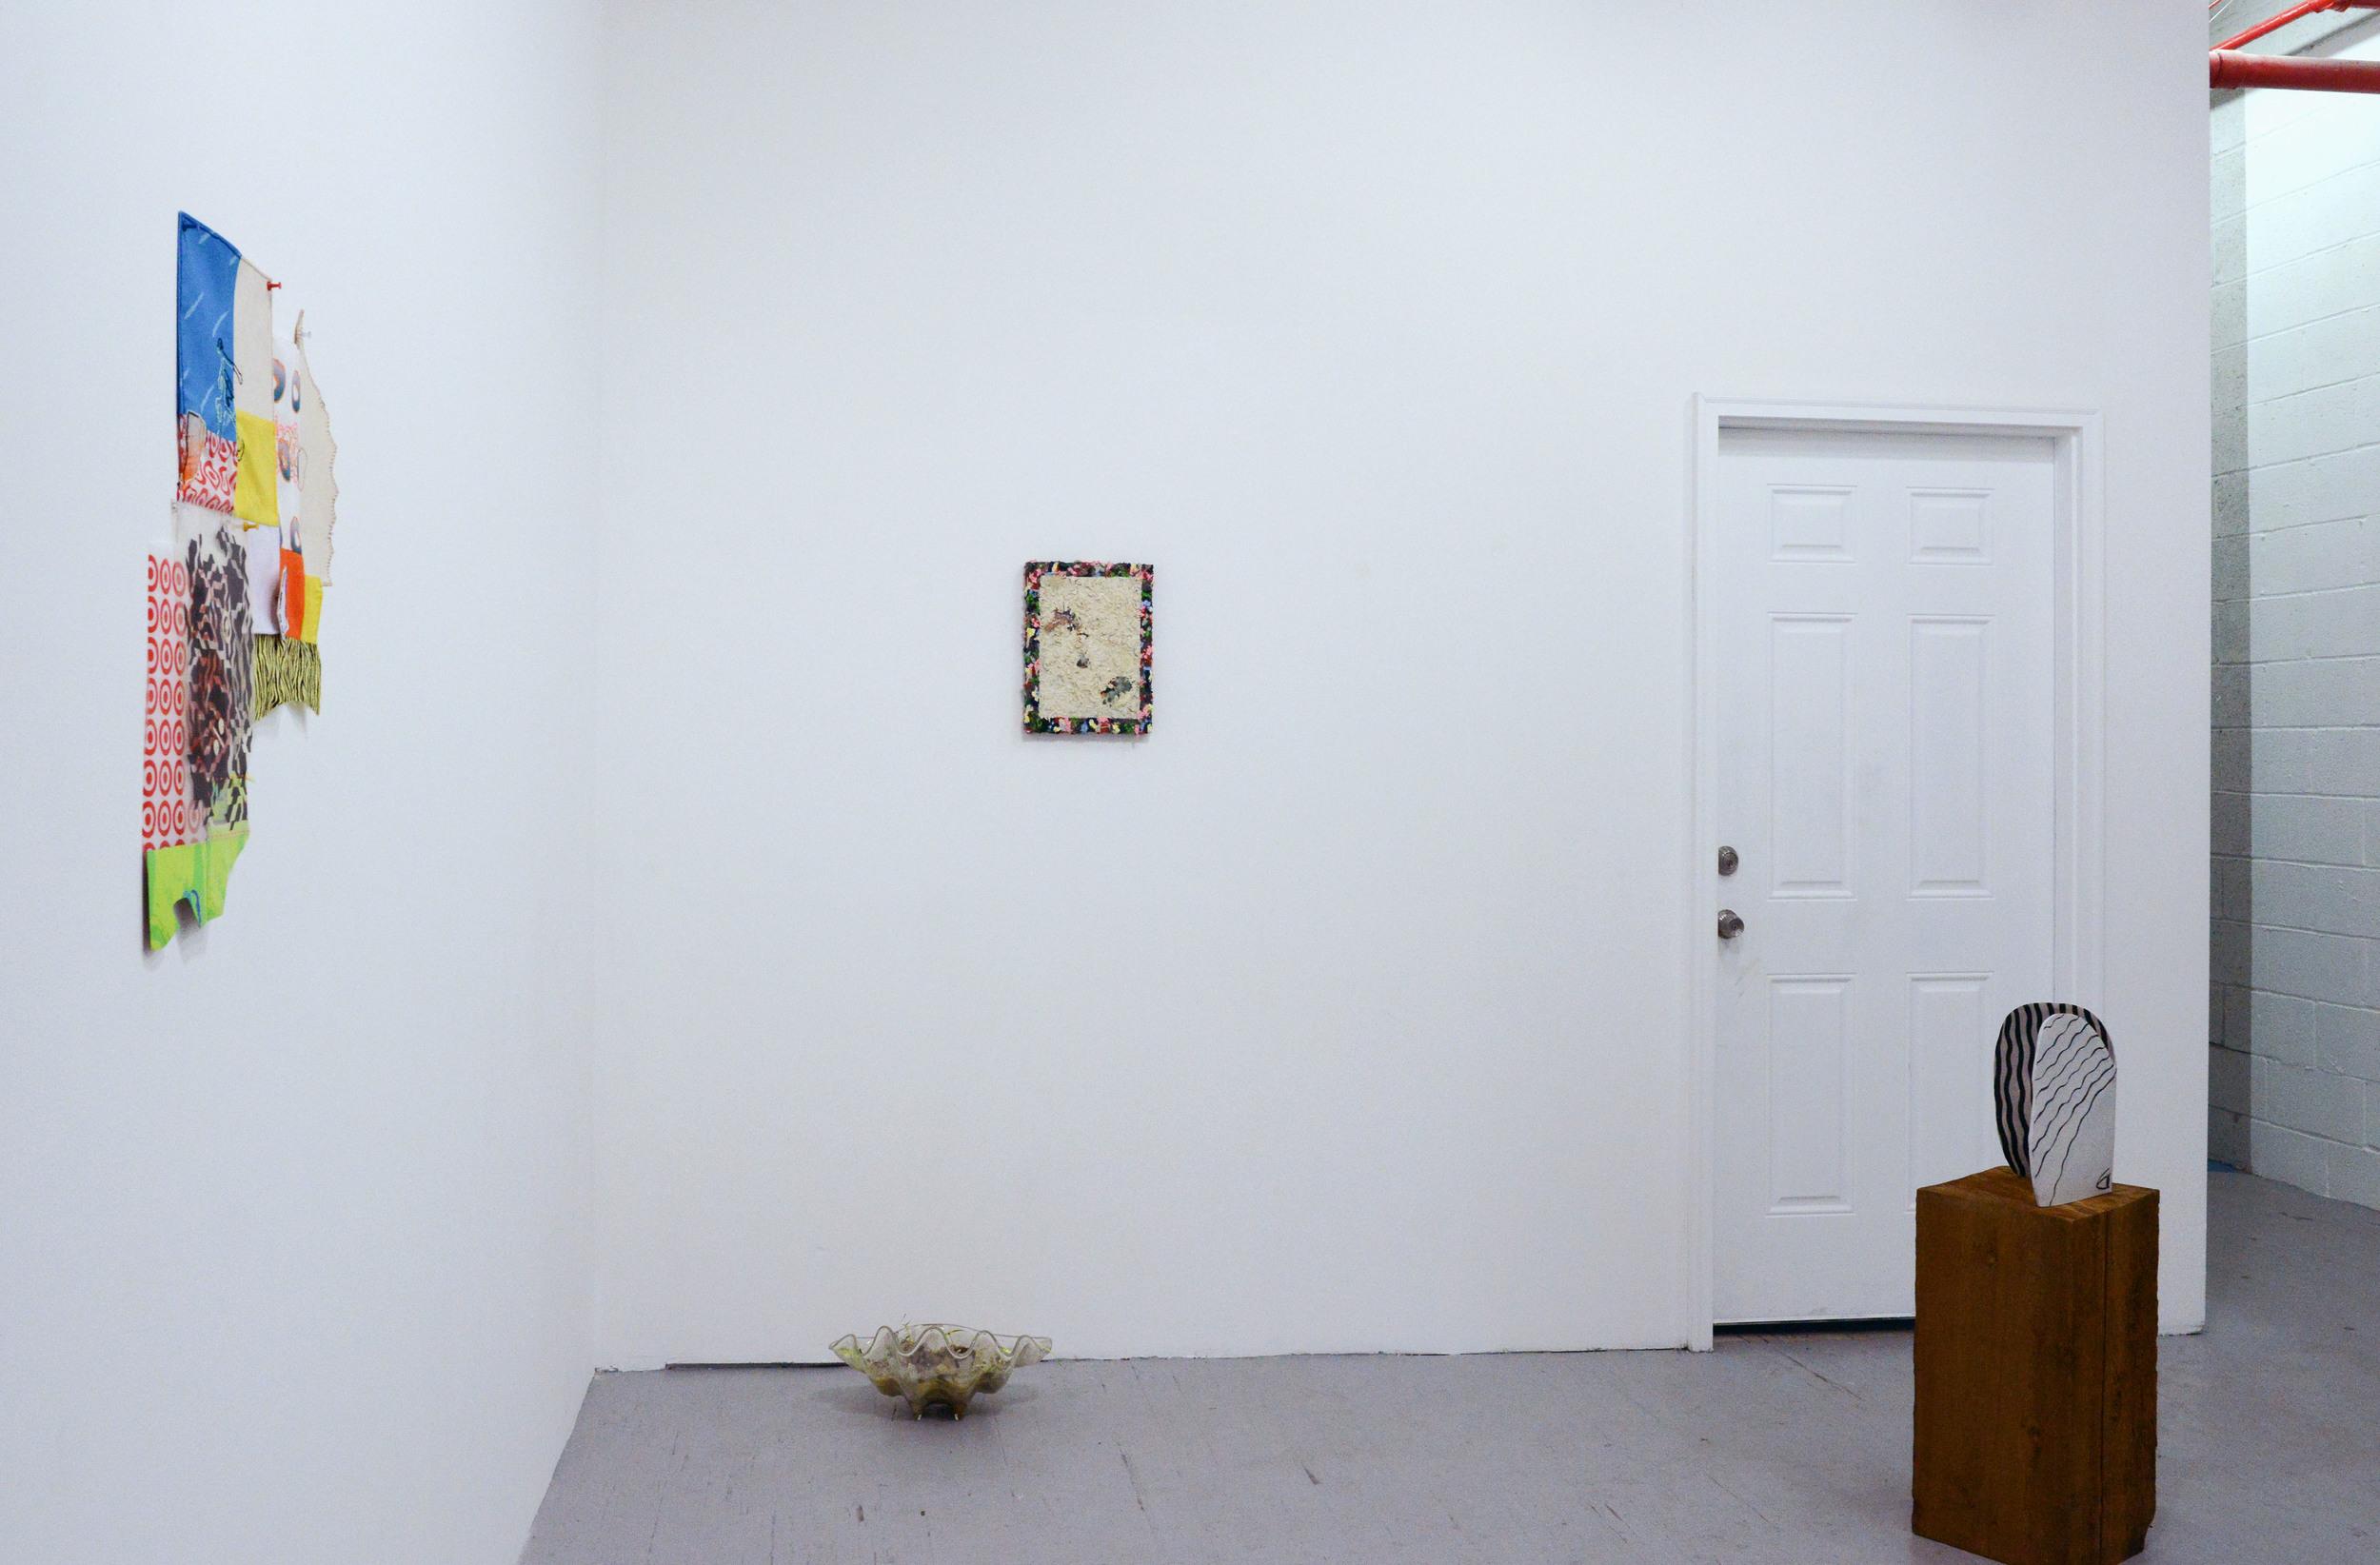 I Wish I Felt This Way At Home   Torrance Shipman Gallery, Brooklyn,NY  Oct - Nov 2015